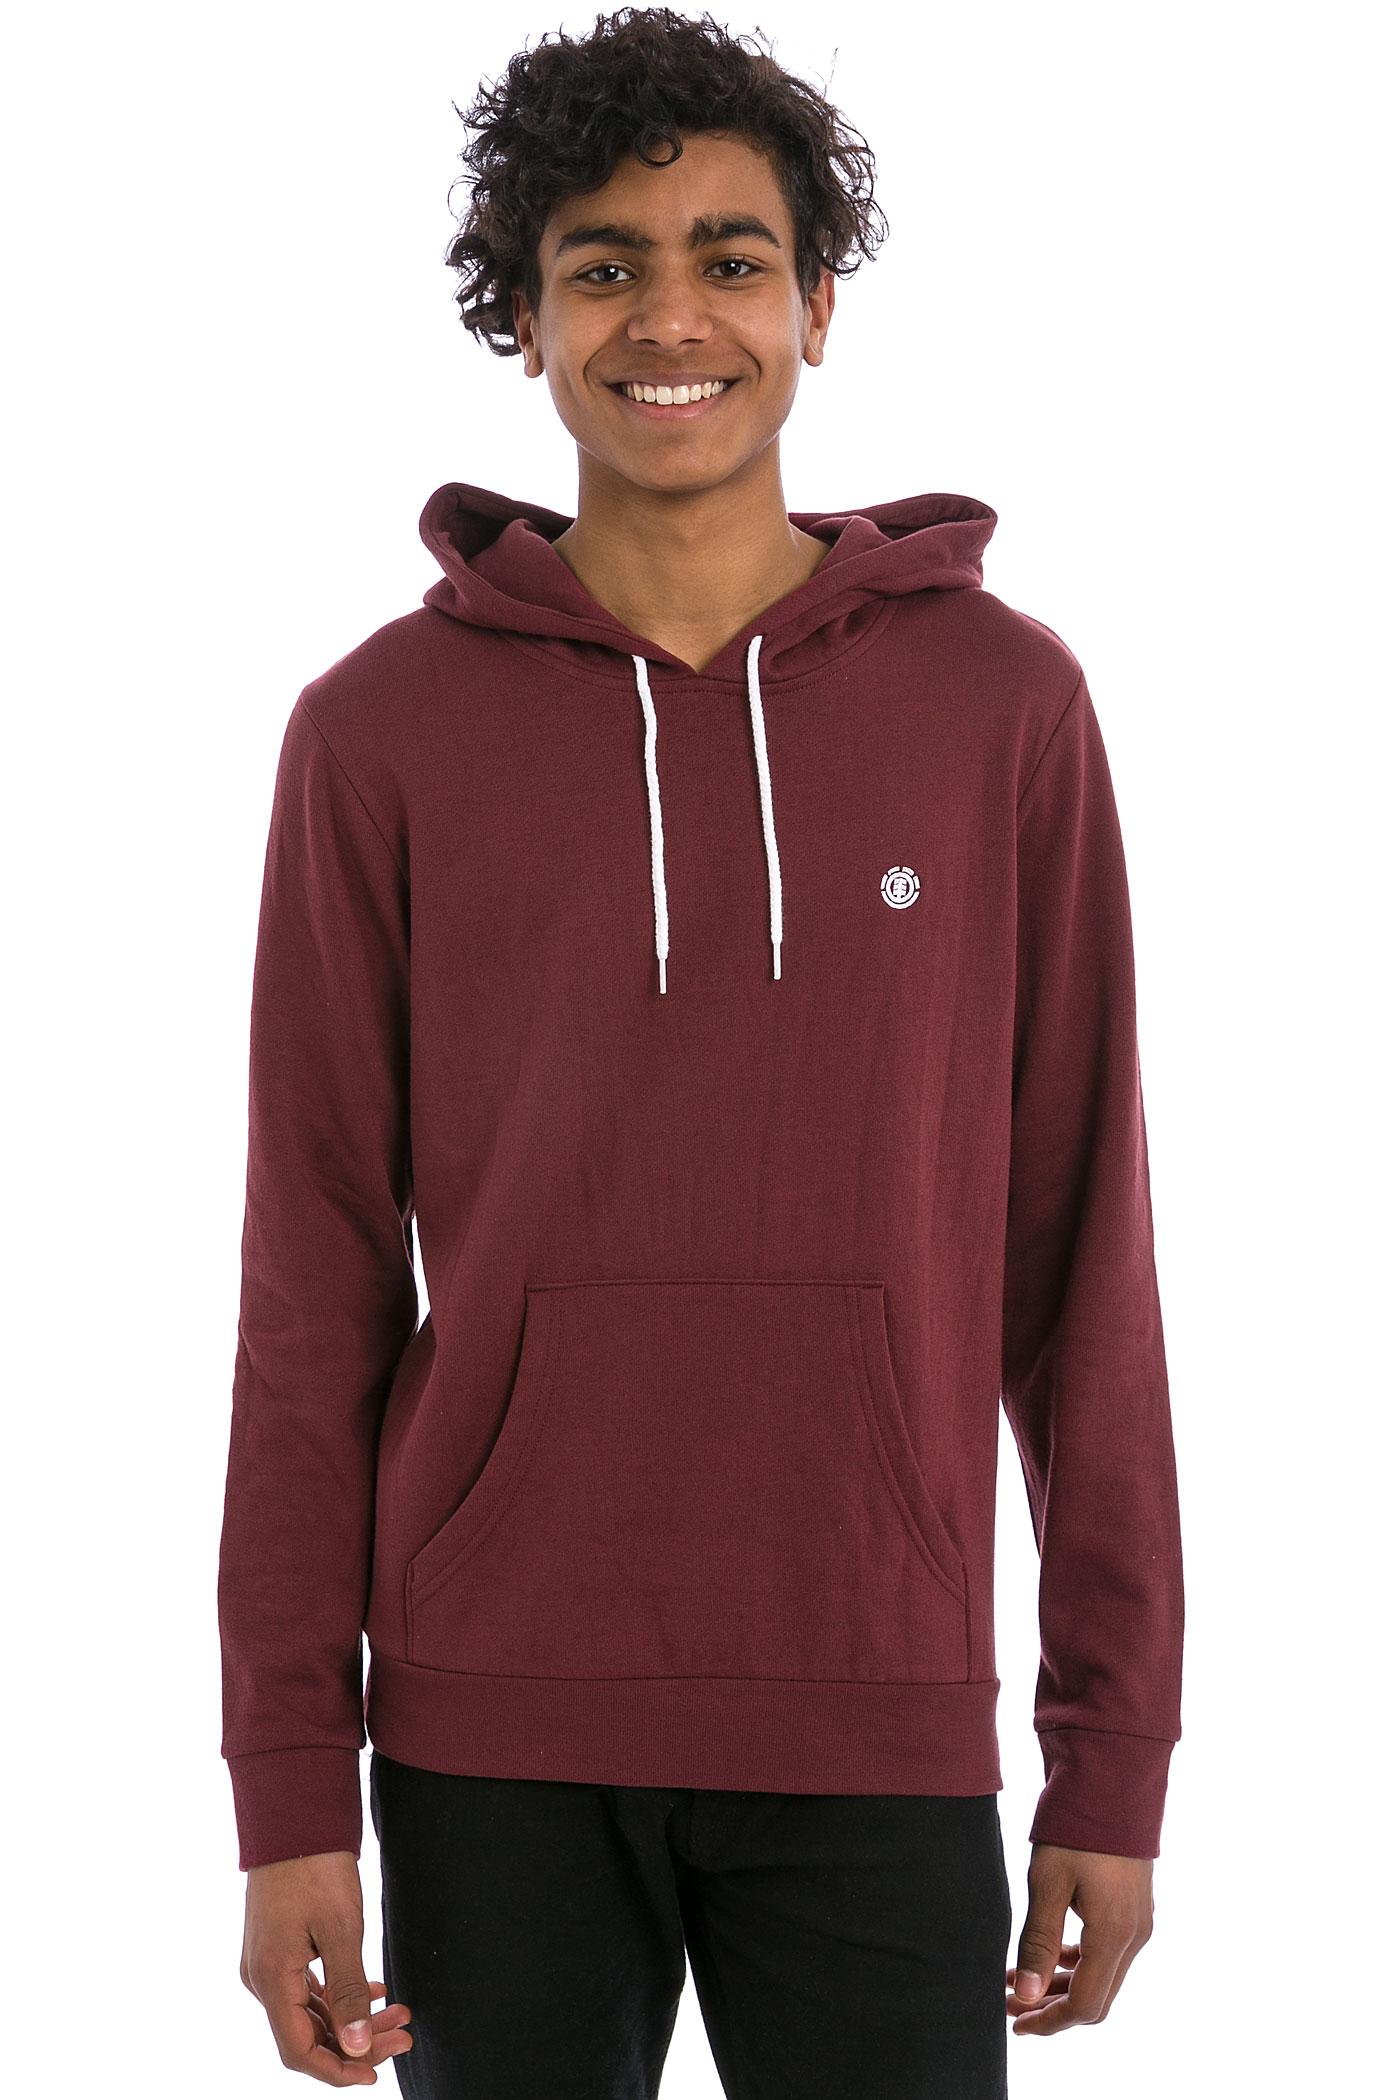 Cornell hoodie